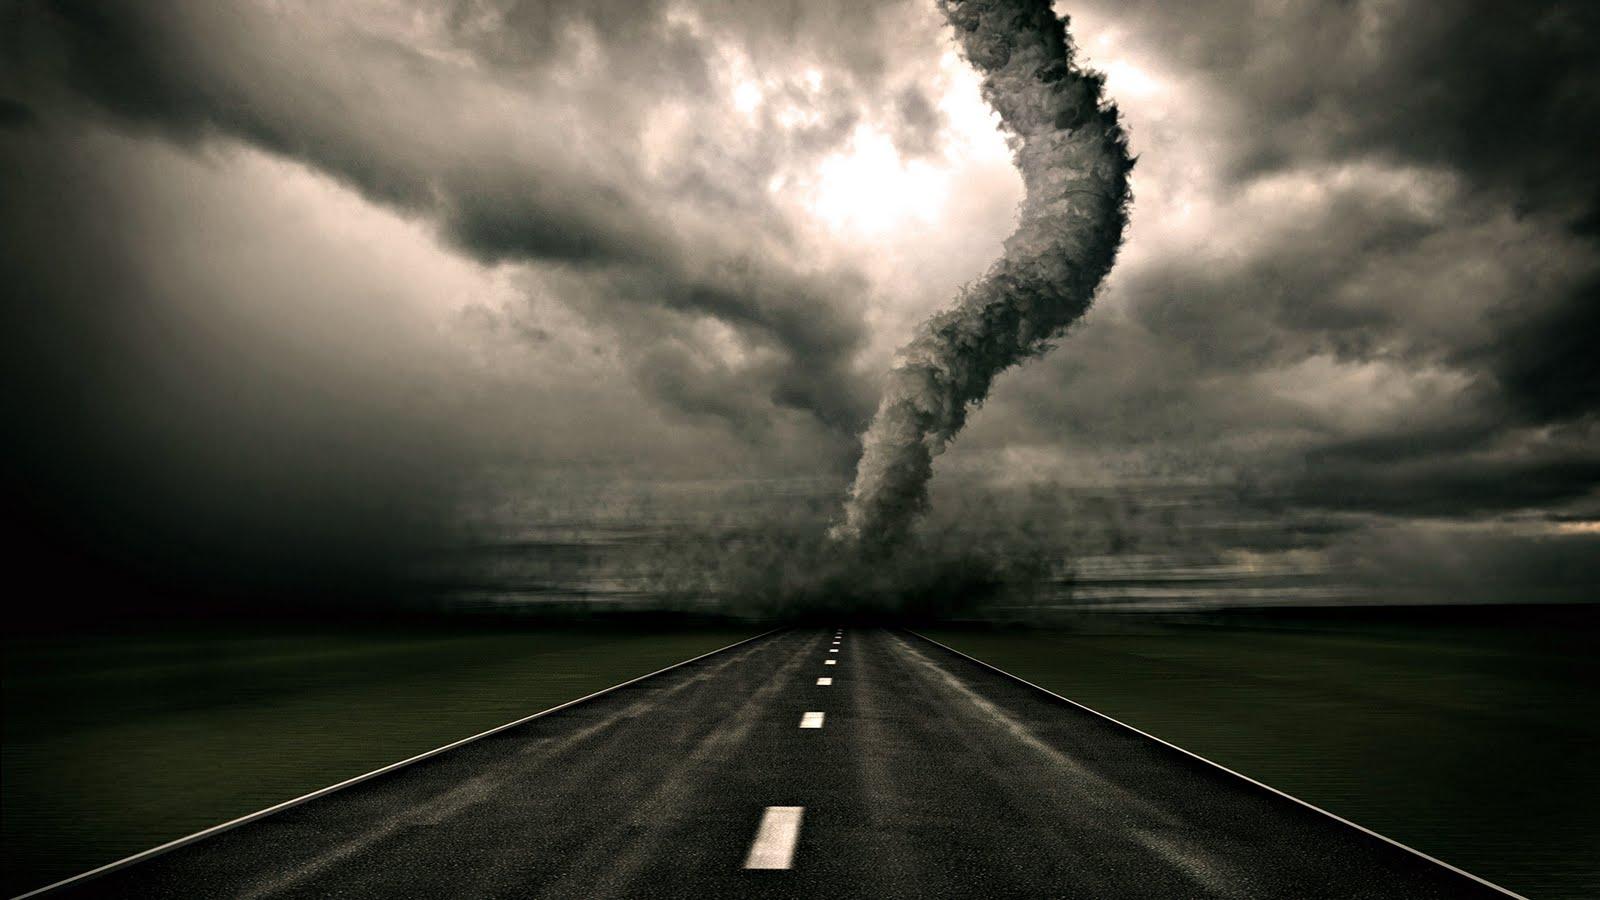 tornado wallpaper hd - photo #7